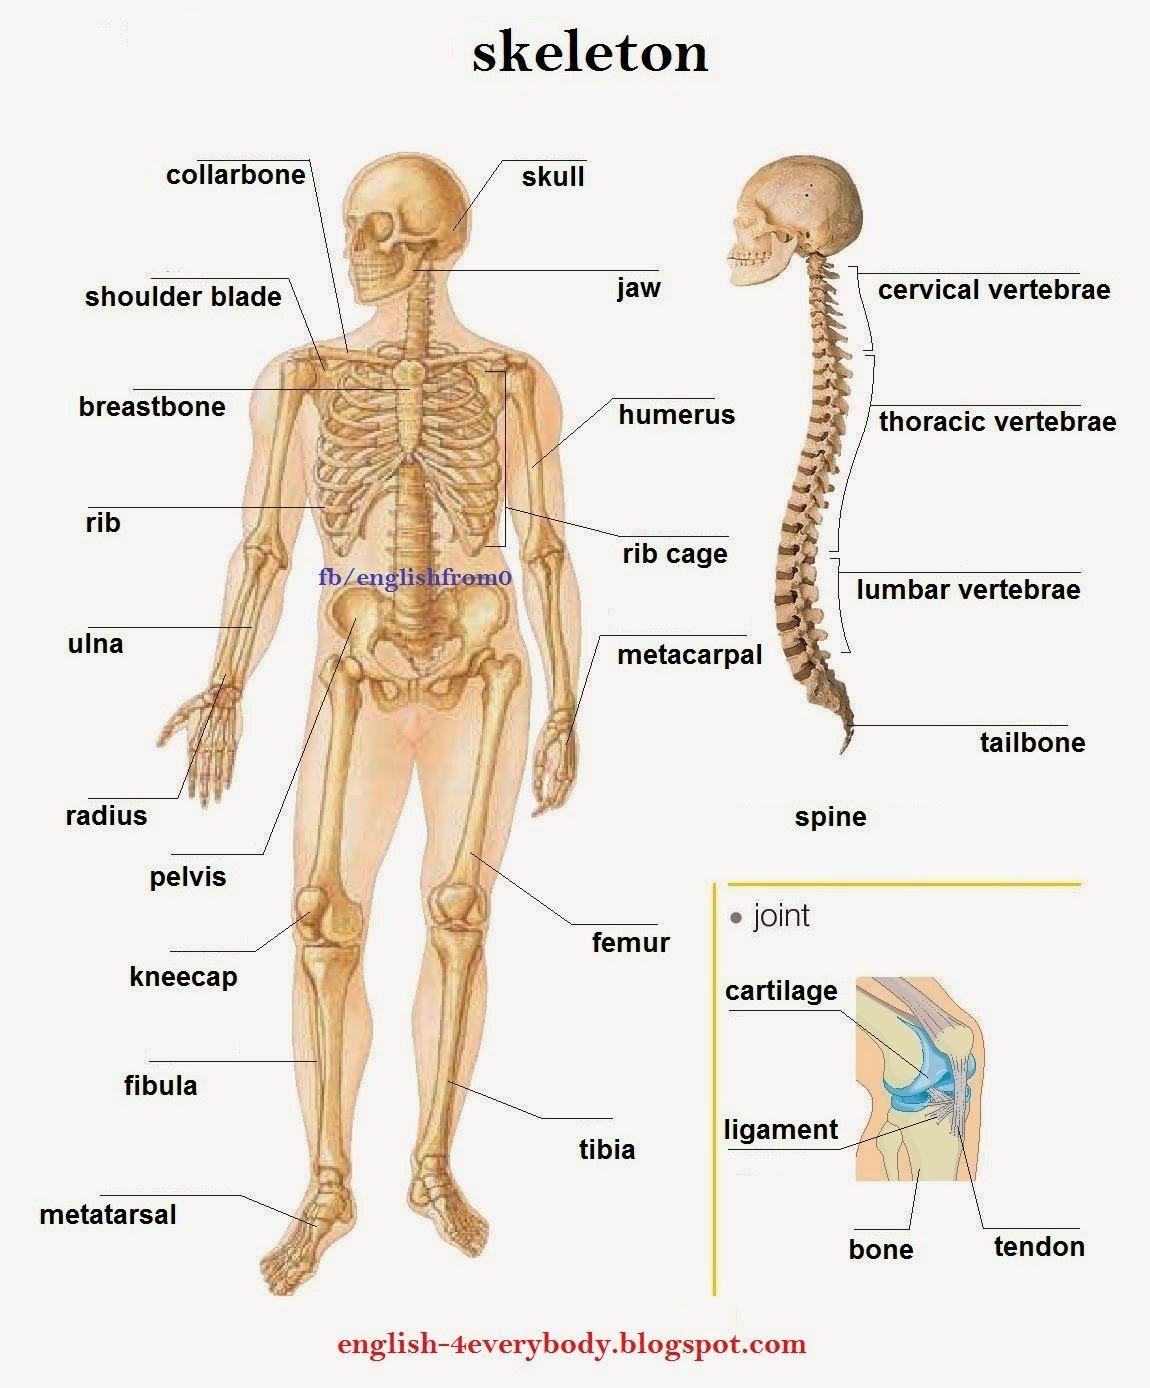 English For Beginners: skeleton | English-4everybody | Pinterest ...